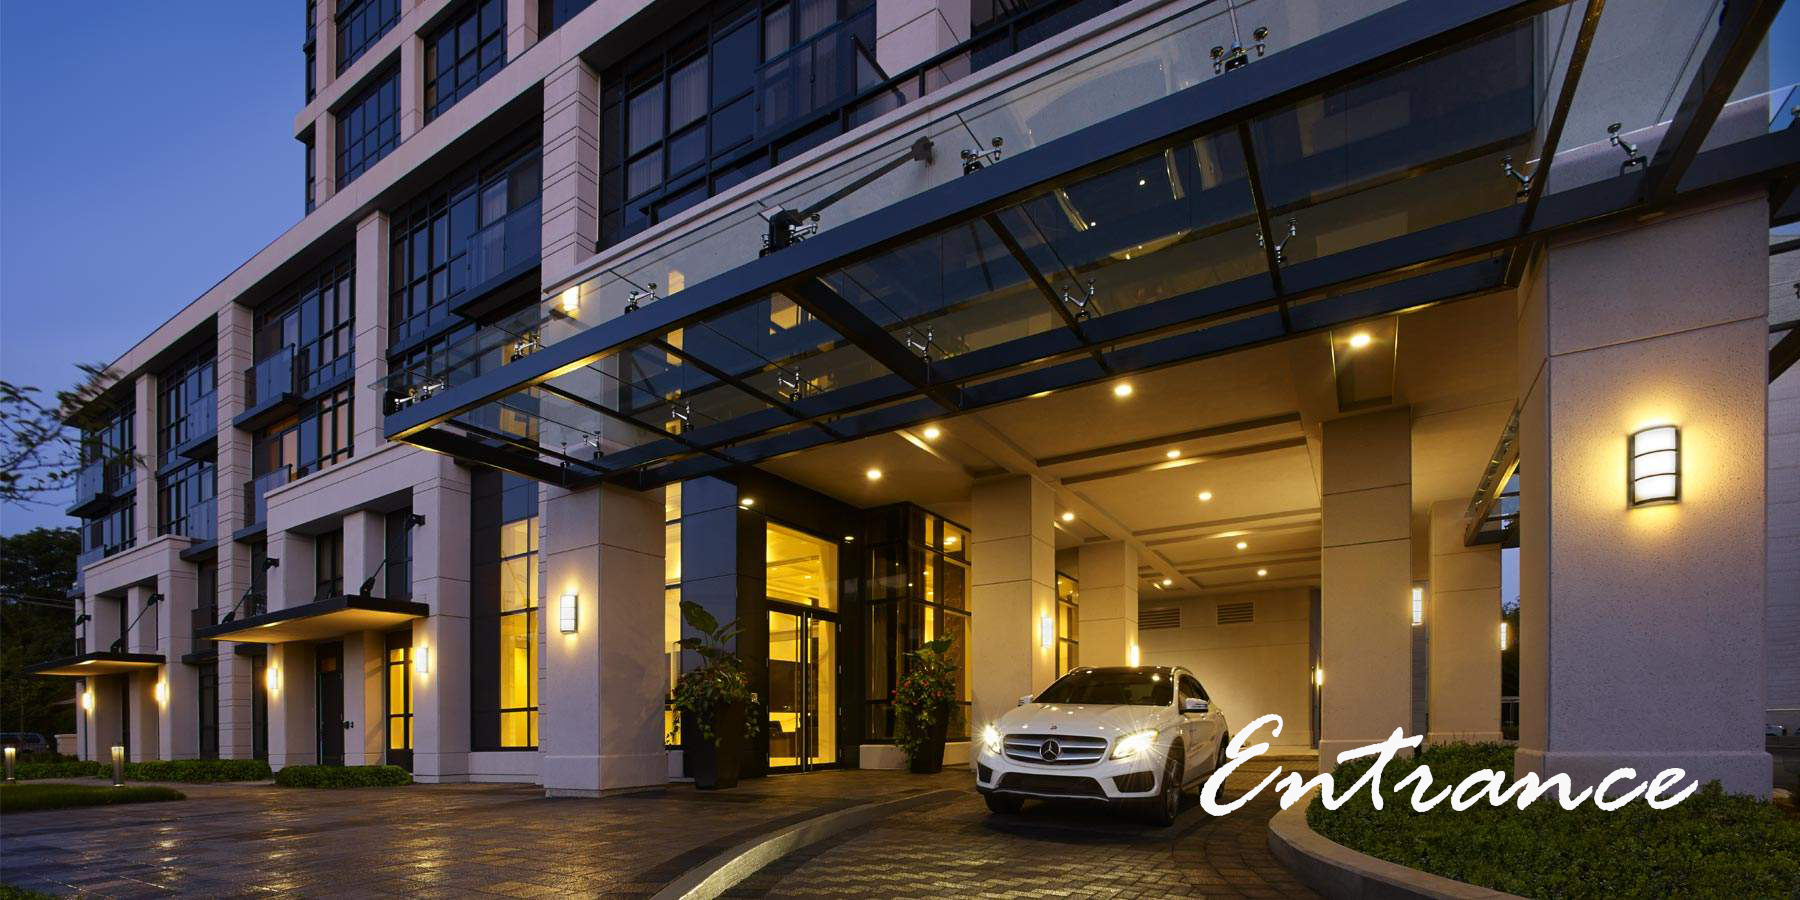 KG Group Roehampton Brand New Luxury Condo Rental Suites Yonge and Eglinton Exterior